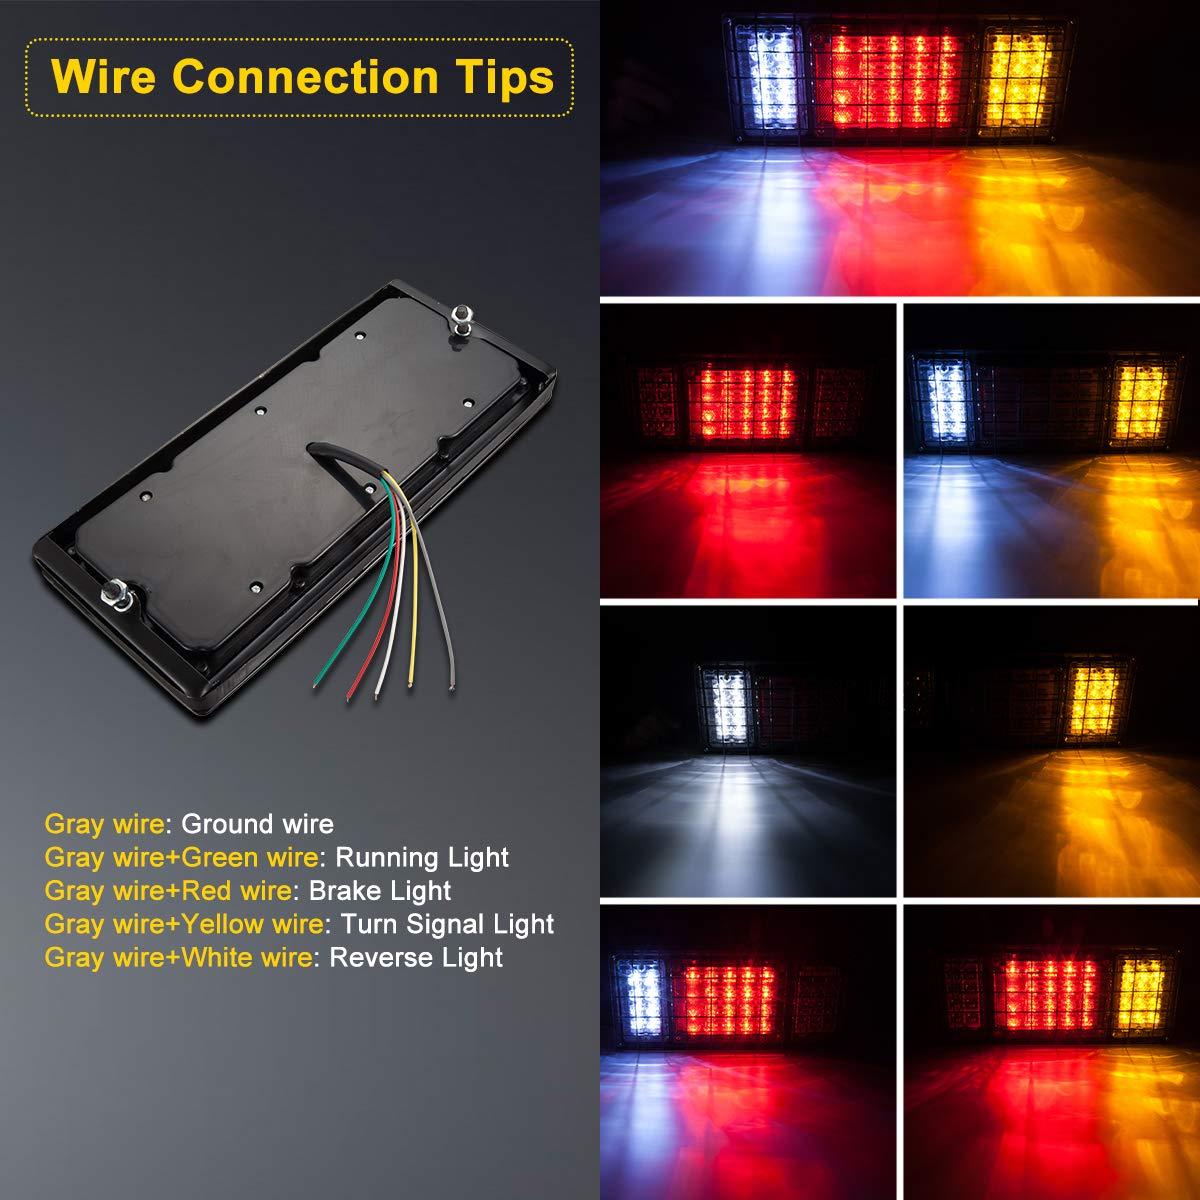 Led Trailer Light Wiring Diagram from m.media-amazon.com